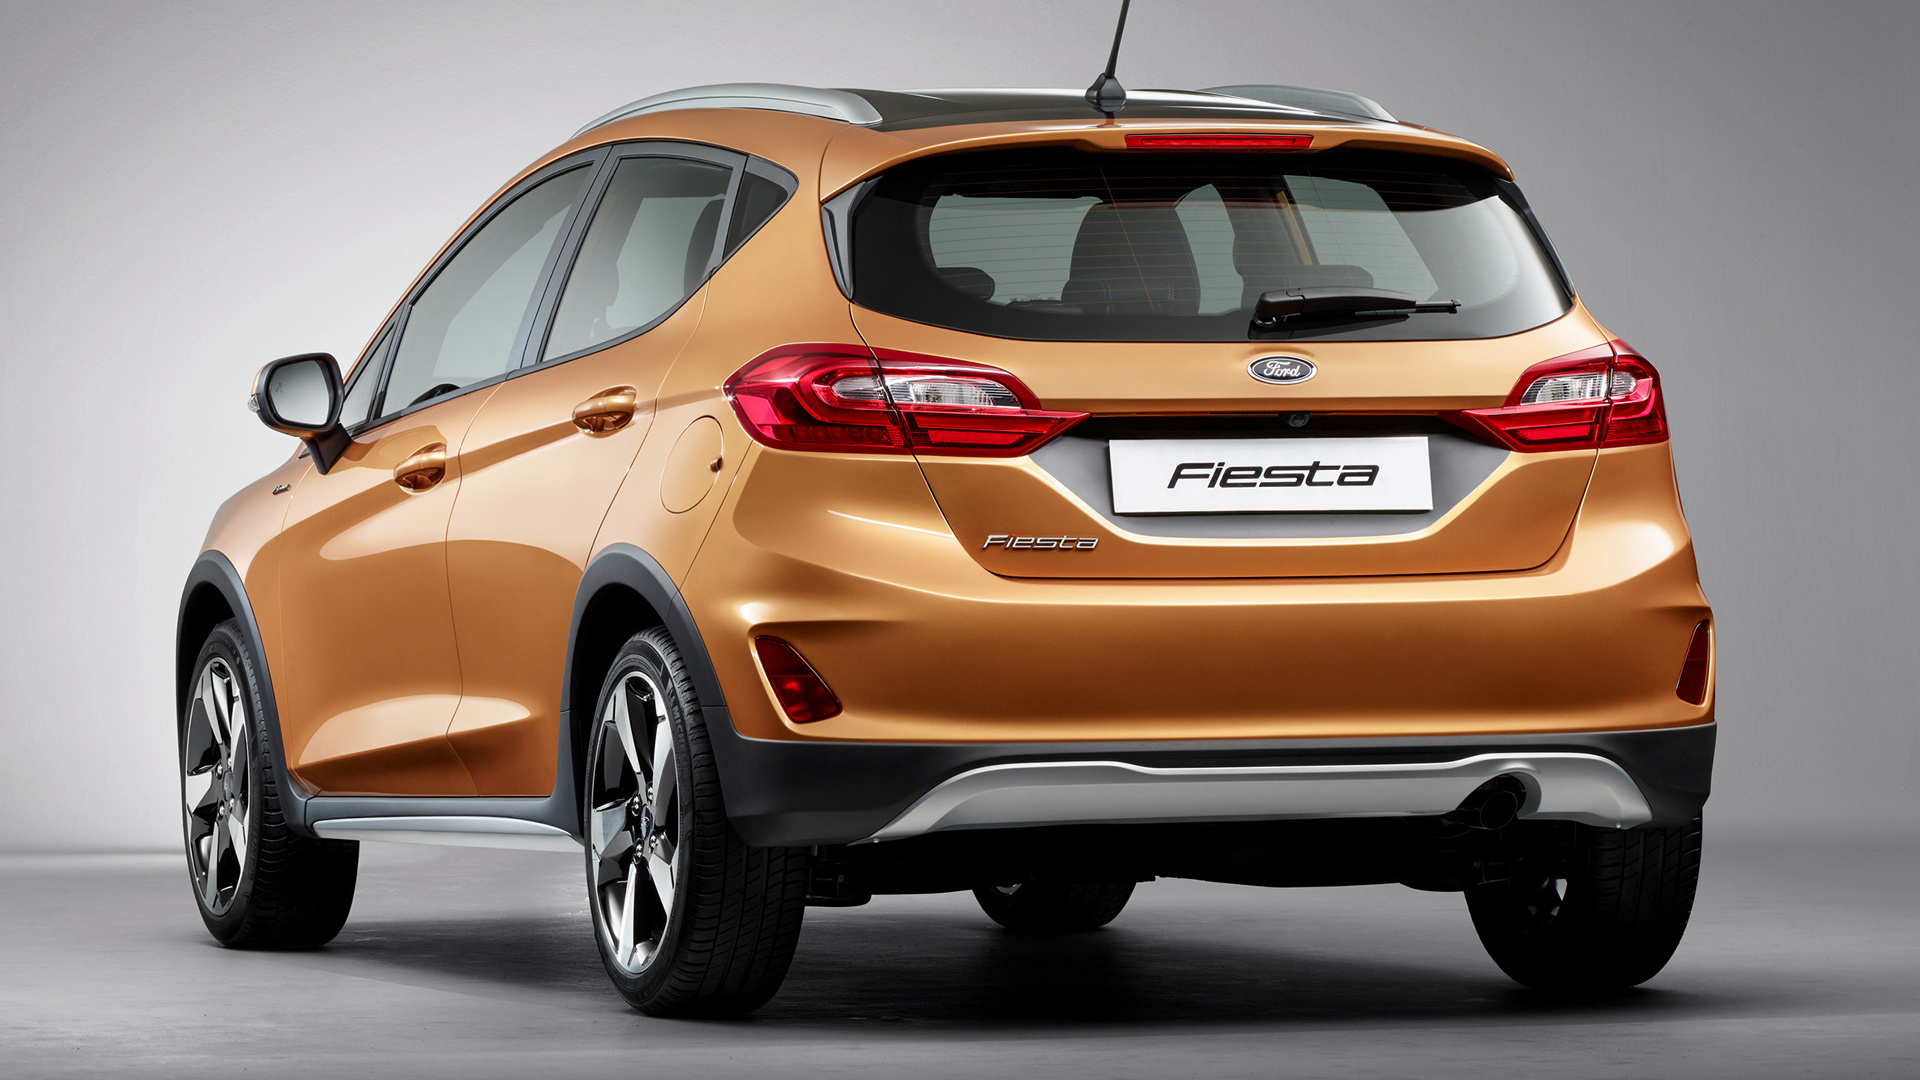 Ford Fiesta Active 5-door (2017) Wallpapers and HD Images - Car Pixel